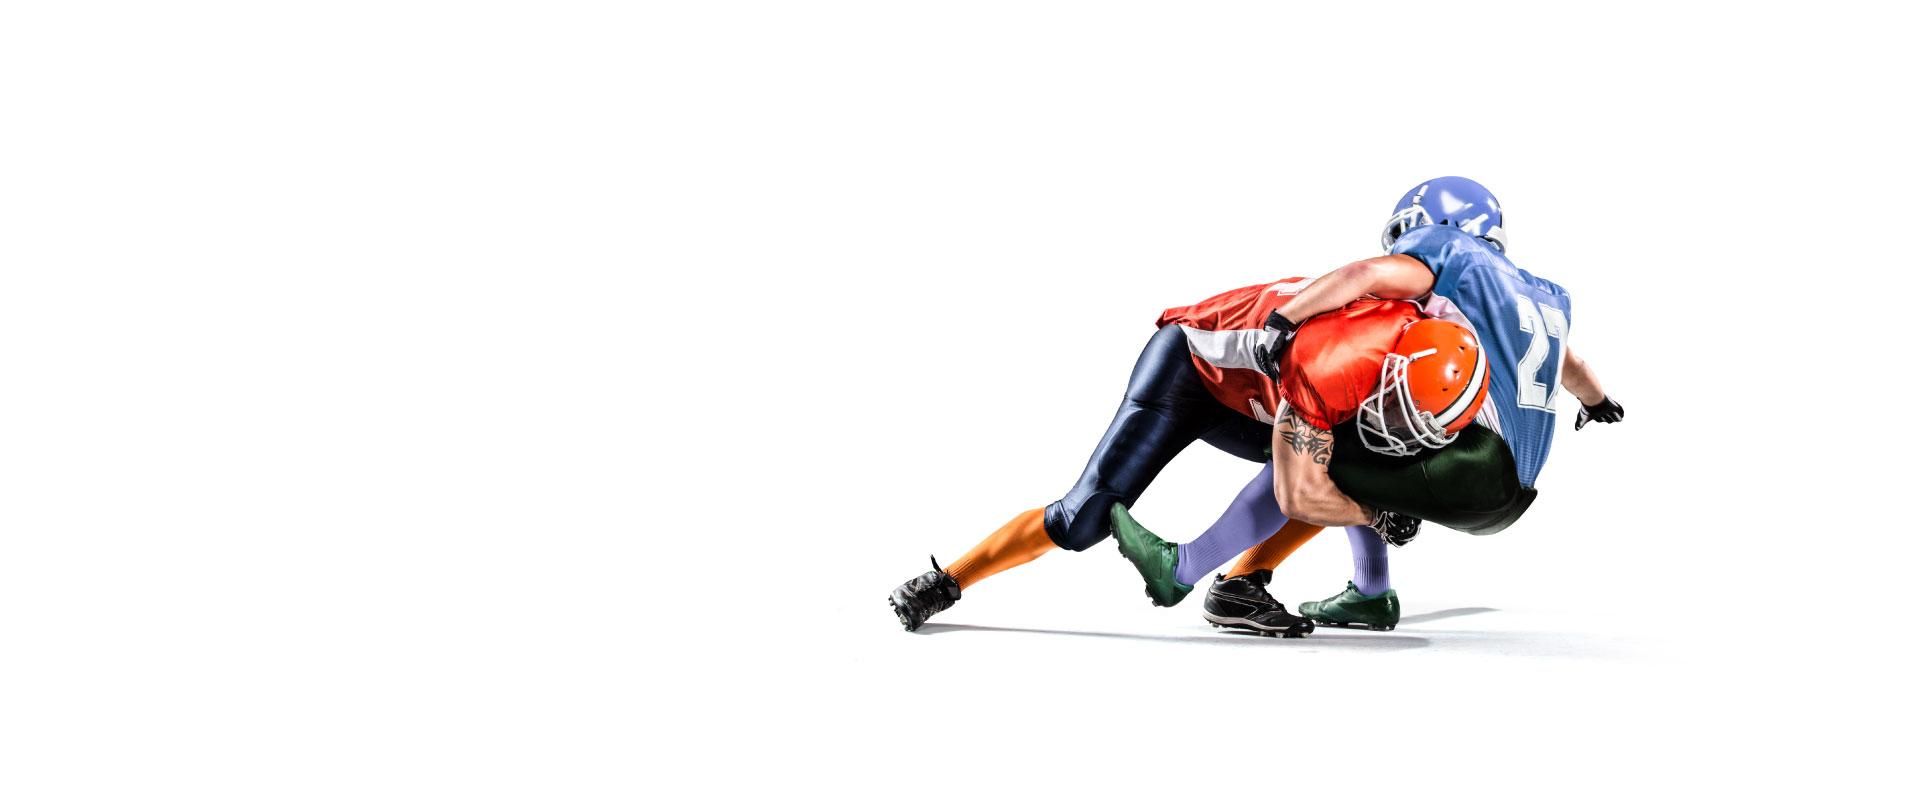 american-football-take-down-banner-2